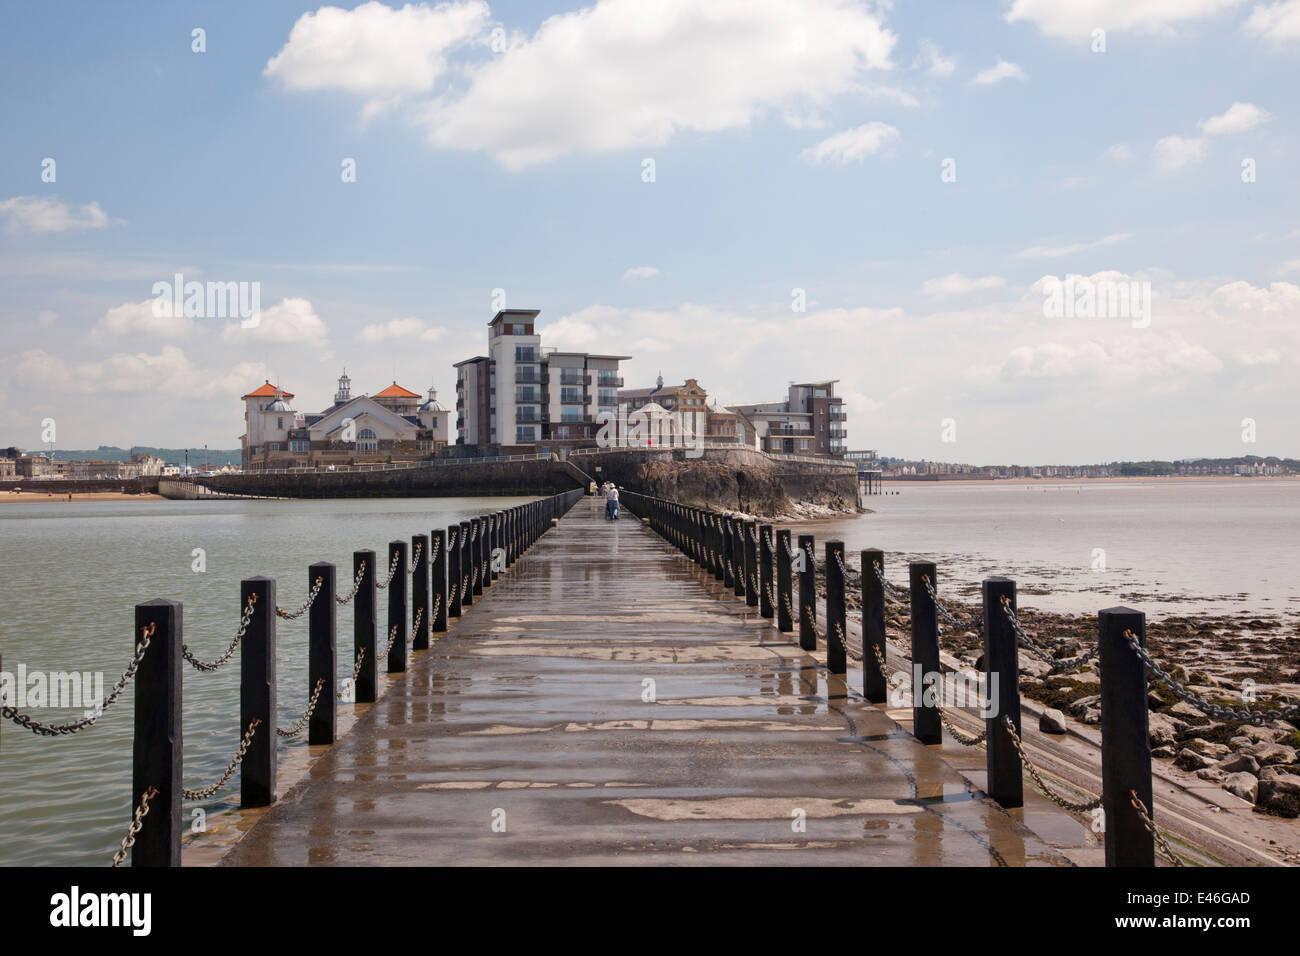 Marine Lake, Weston Super Mare, Somerset. - Stock Image